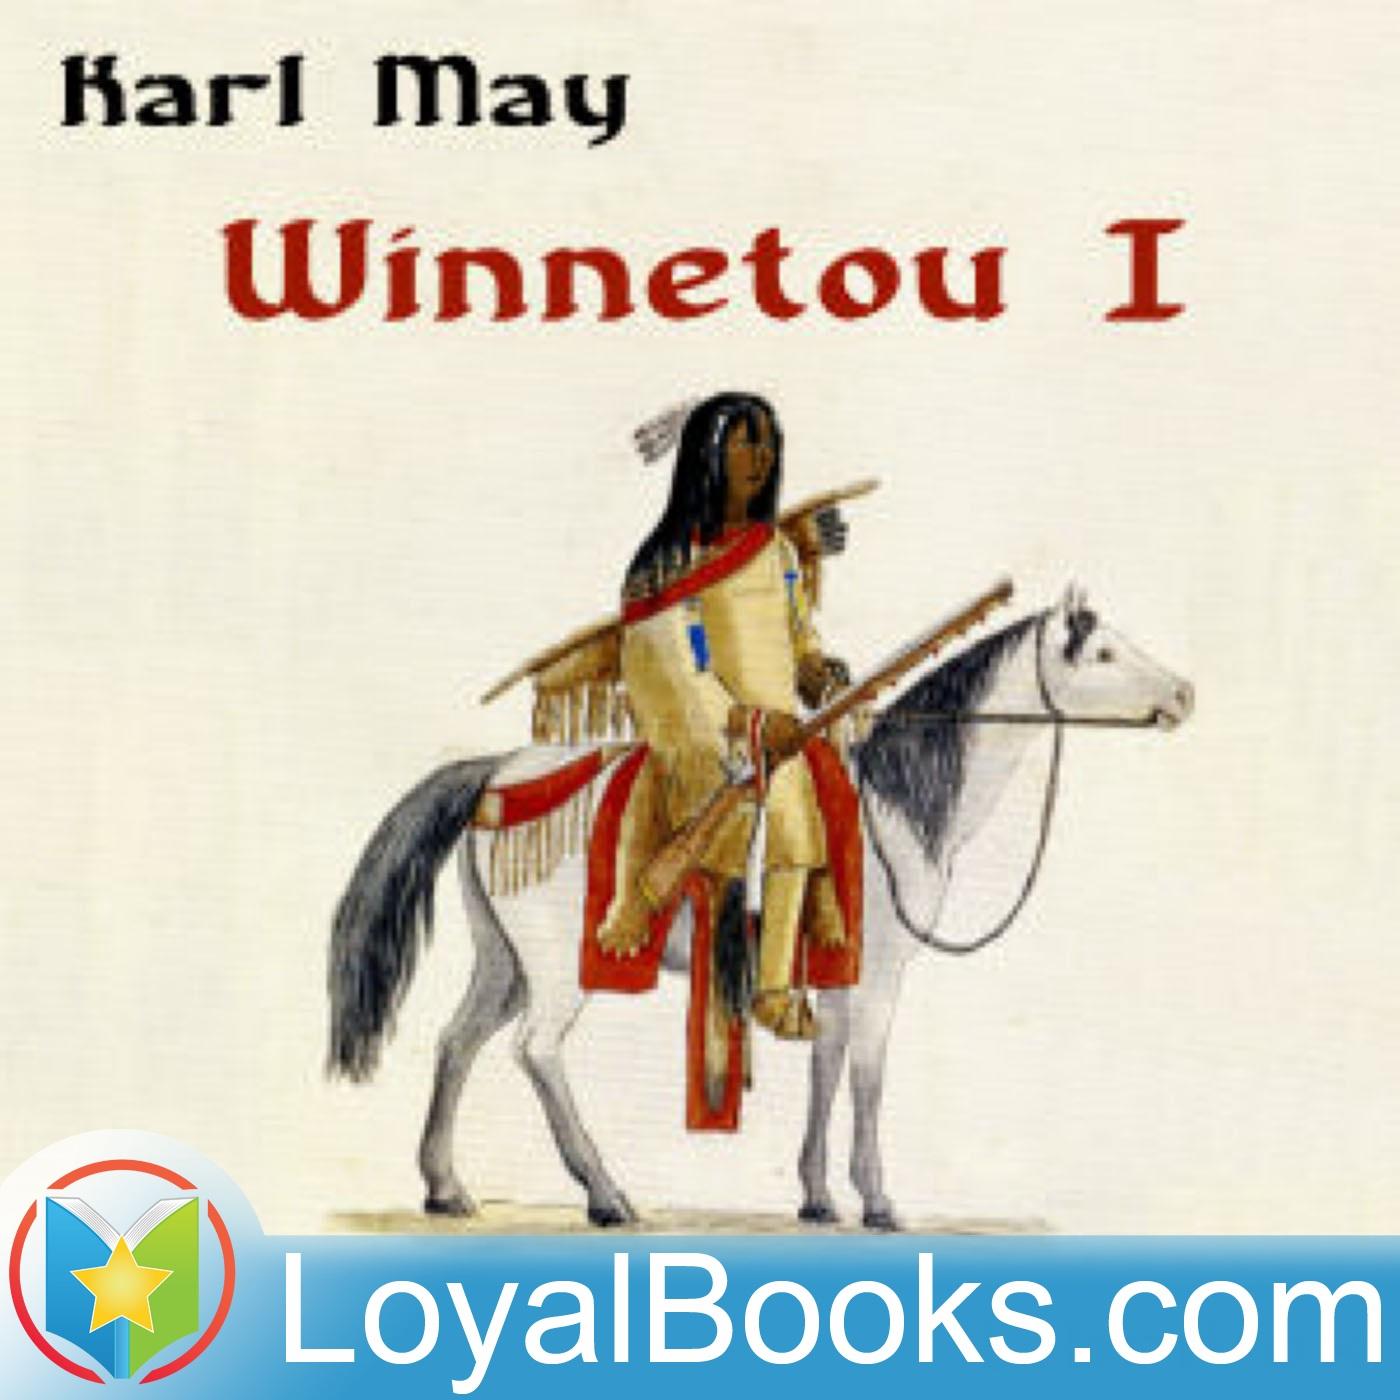 <![CDATA[Winnetou I by Karl May]]>